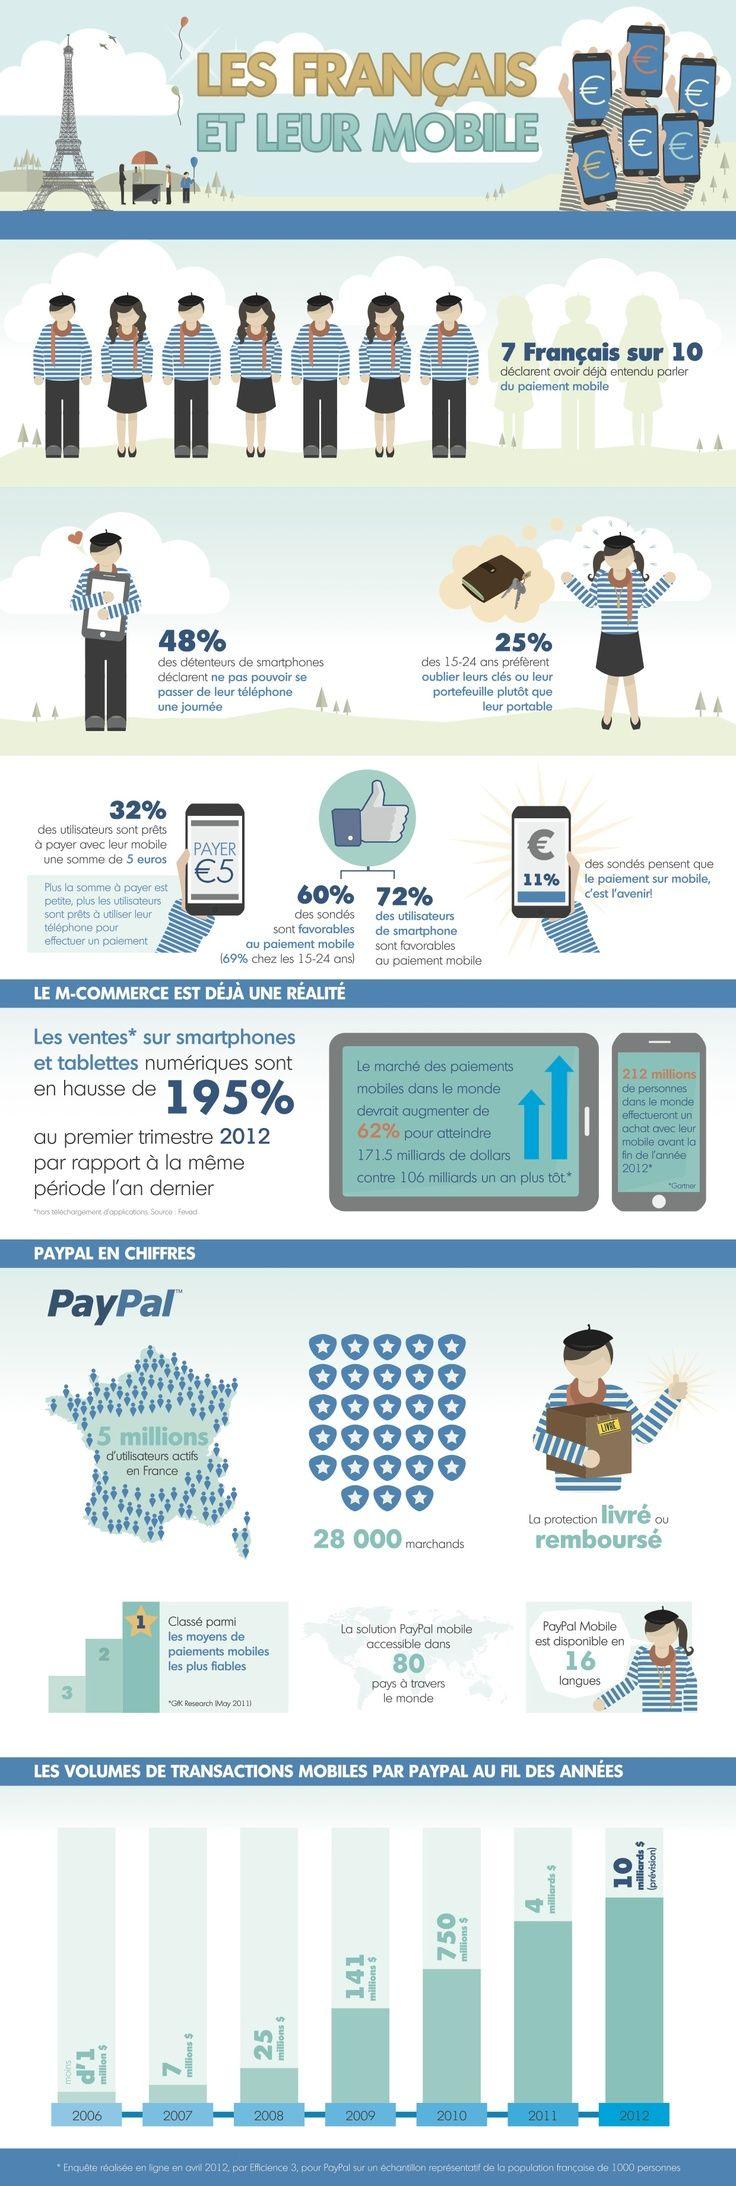 infographie-francais-mobile.jpg (736×2186)